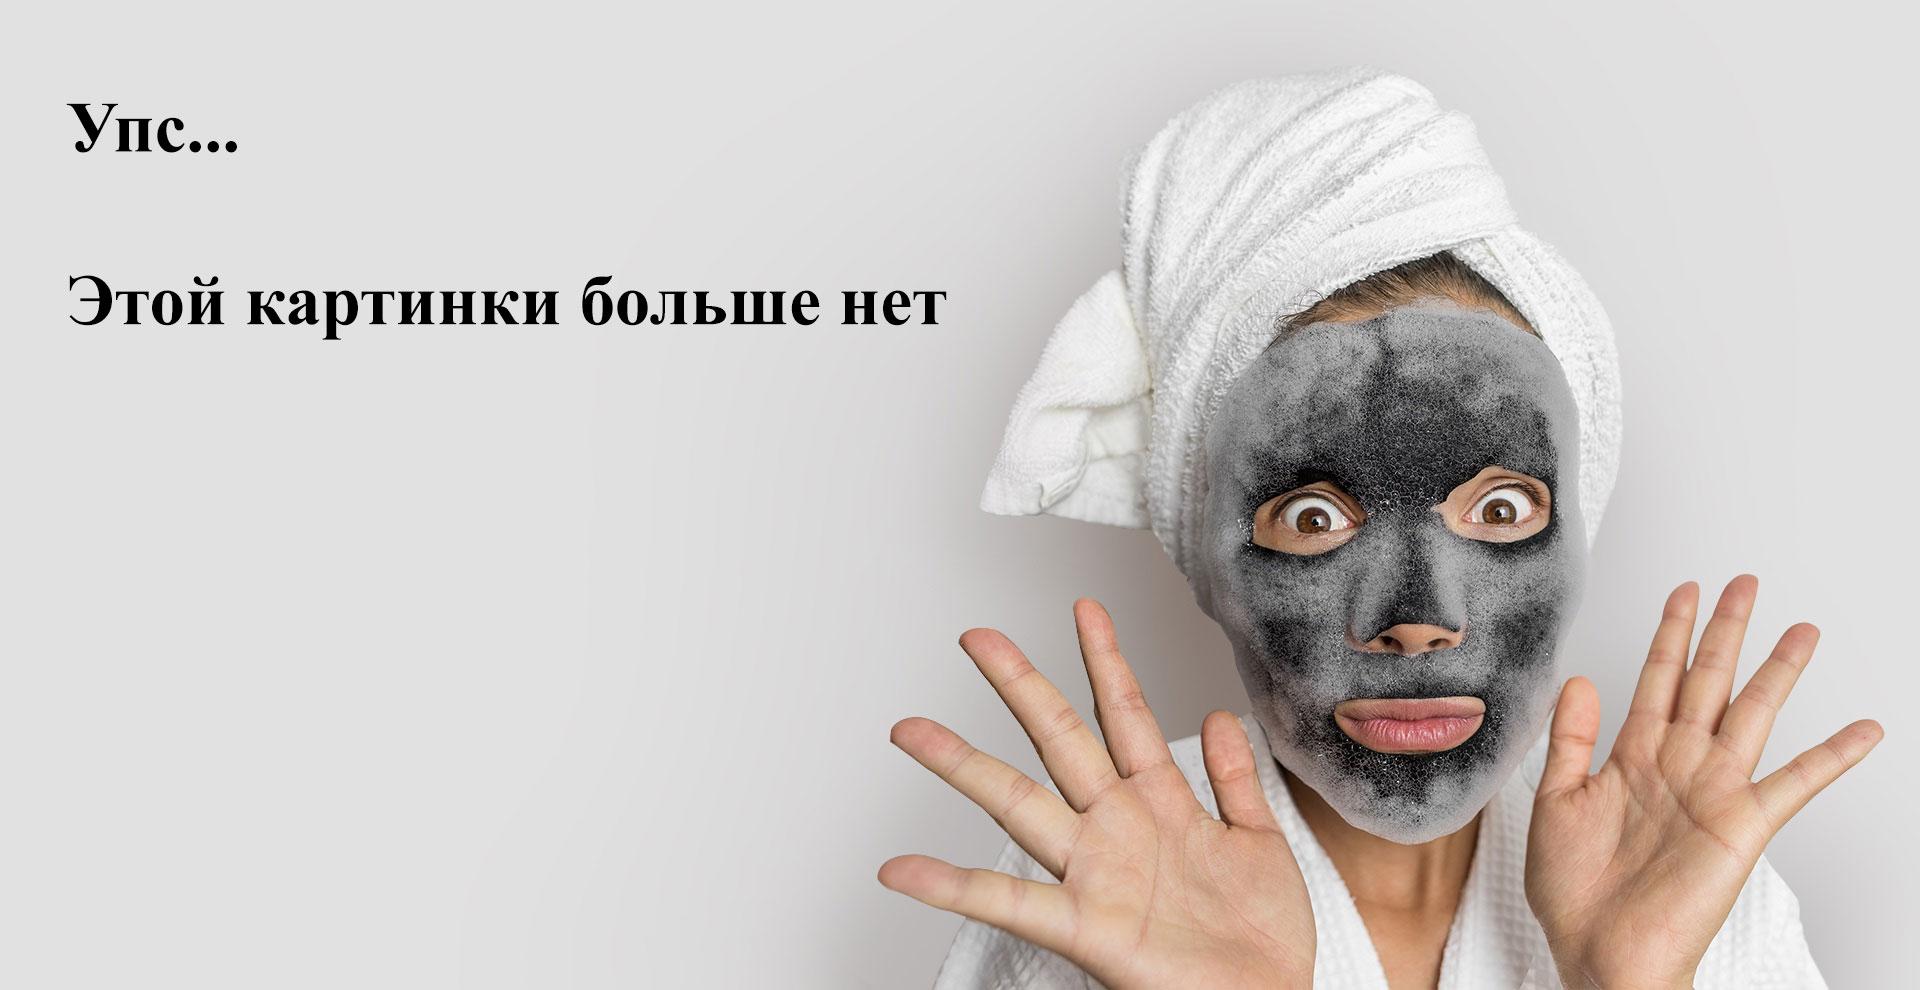 Kocostar, Маска для лица и тела «Огурец», 20 мл (УЦЕНКА)